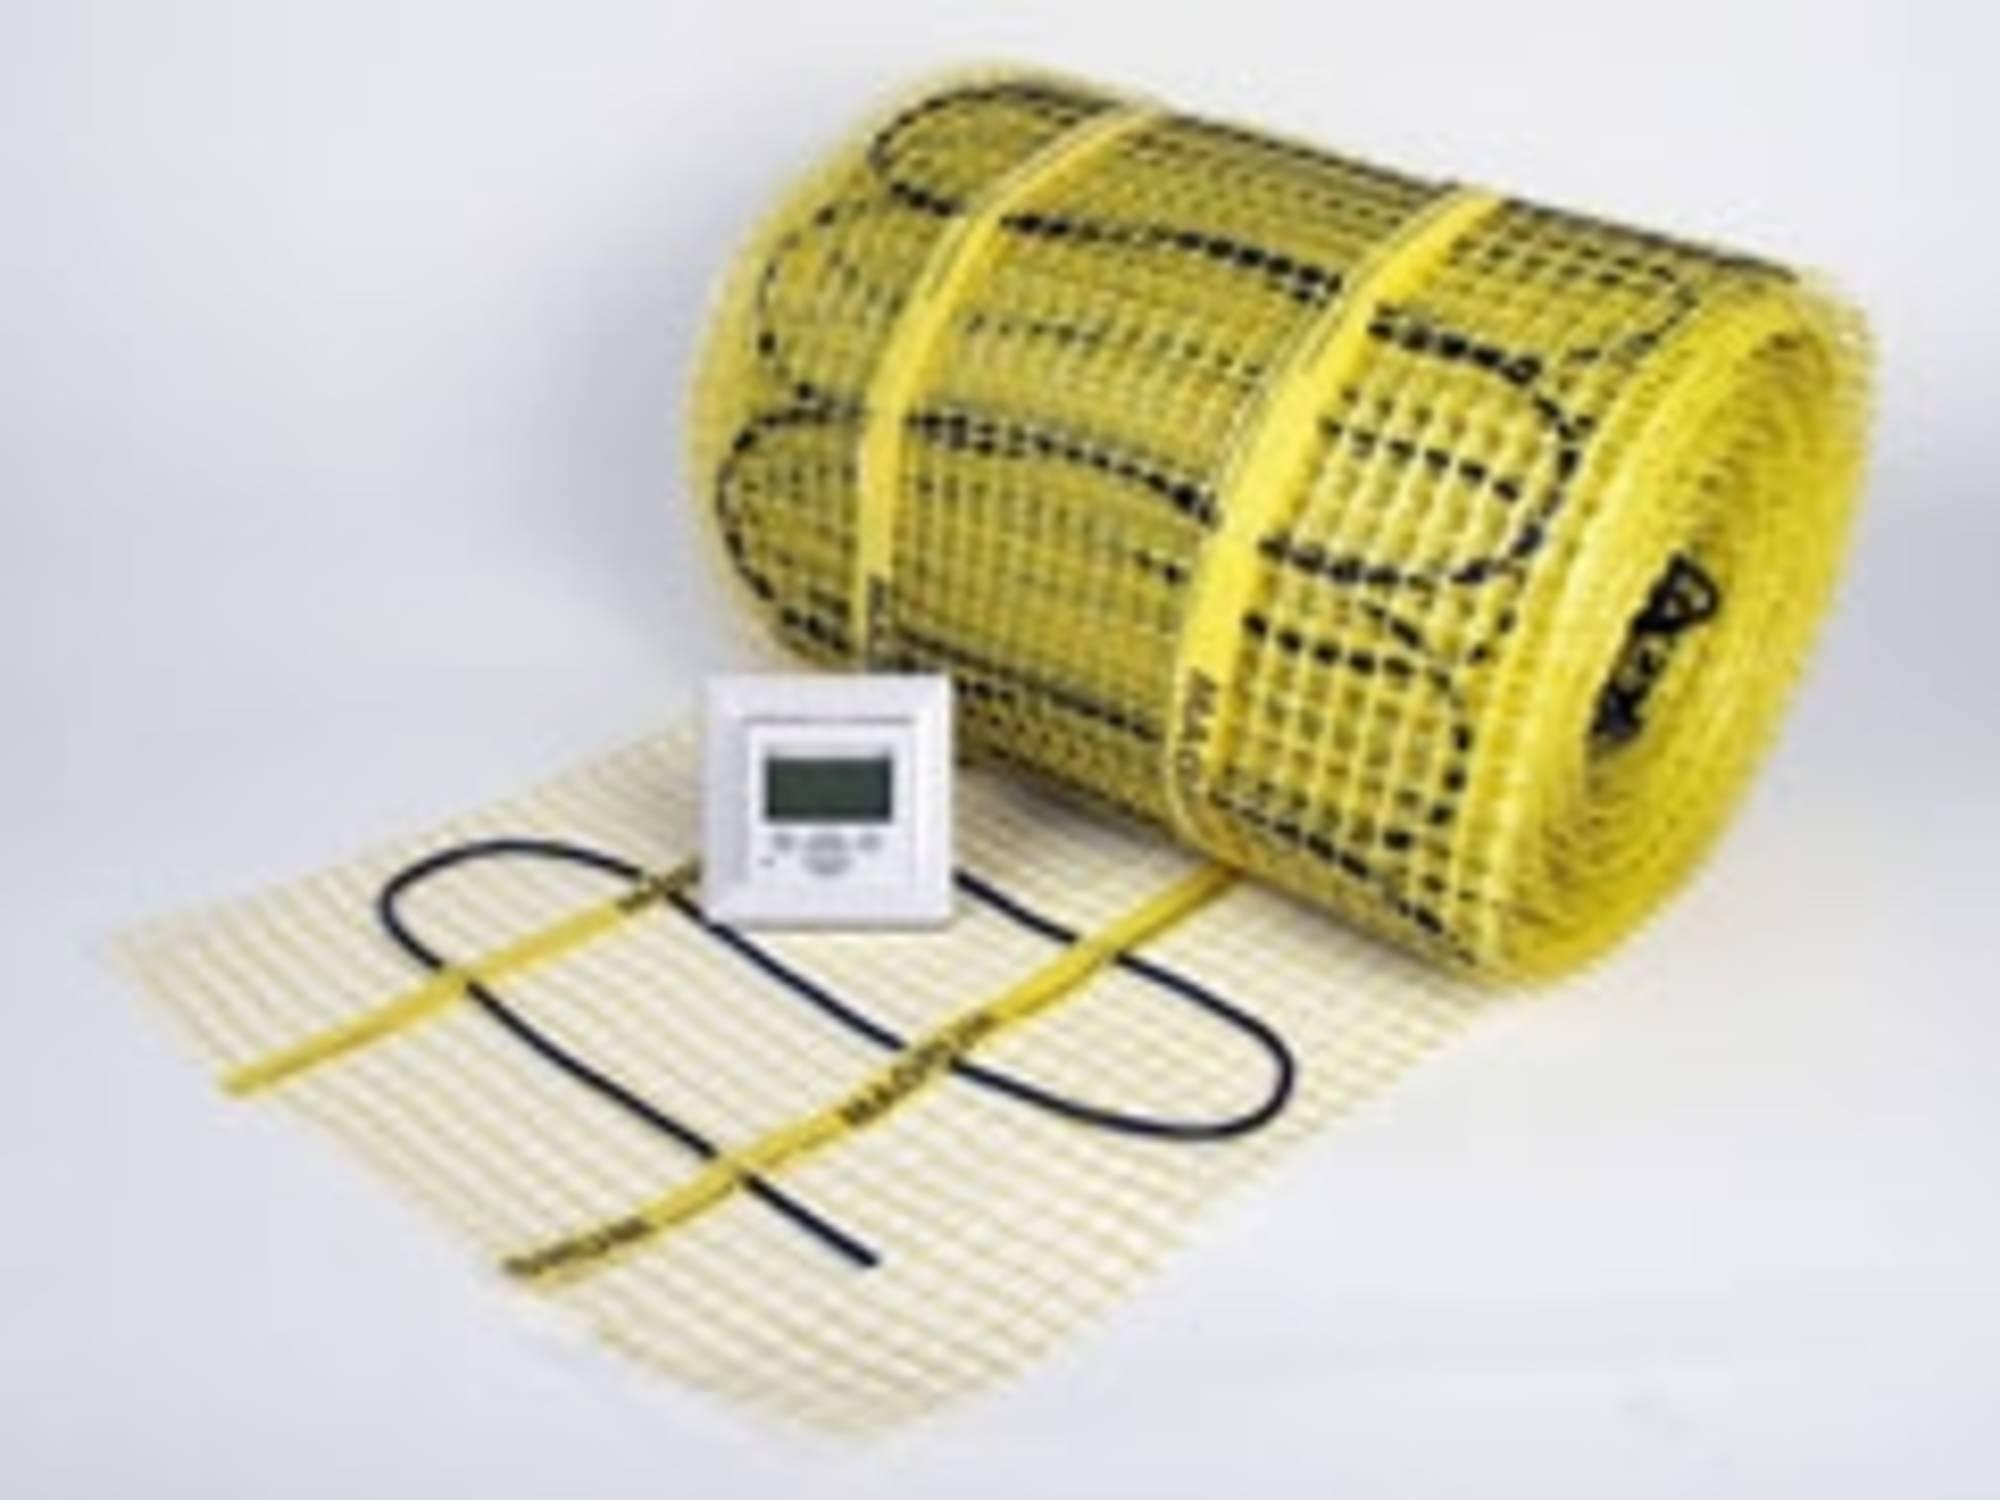 Magnum X-treme control verwarmingsmat small 500x25 1,25 m2 187w